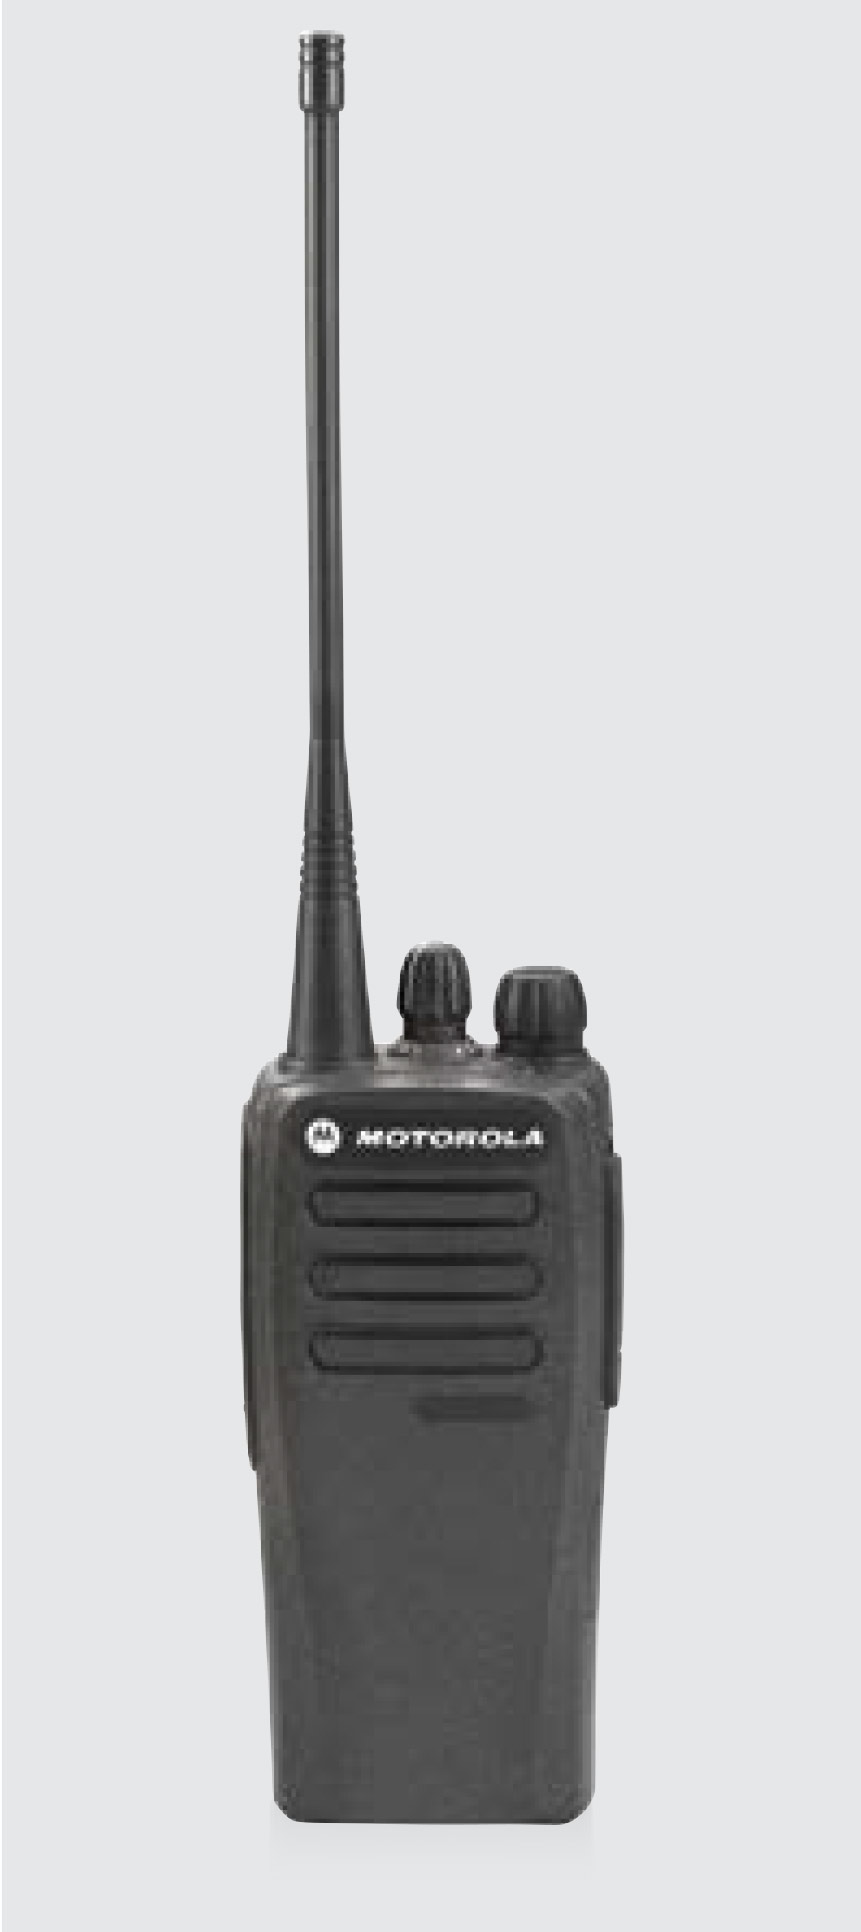 professional radio suppliers in dubai